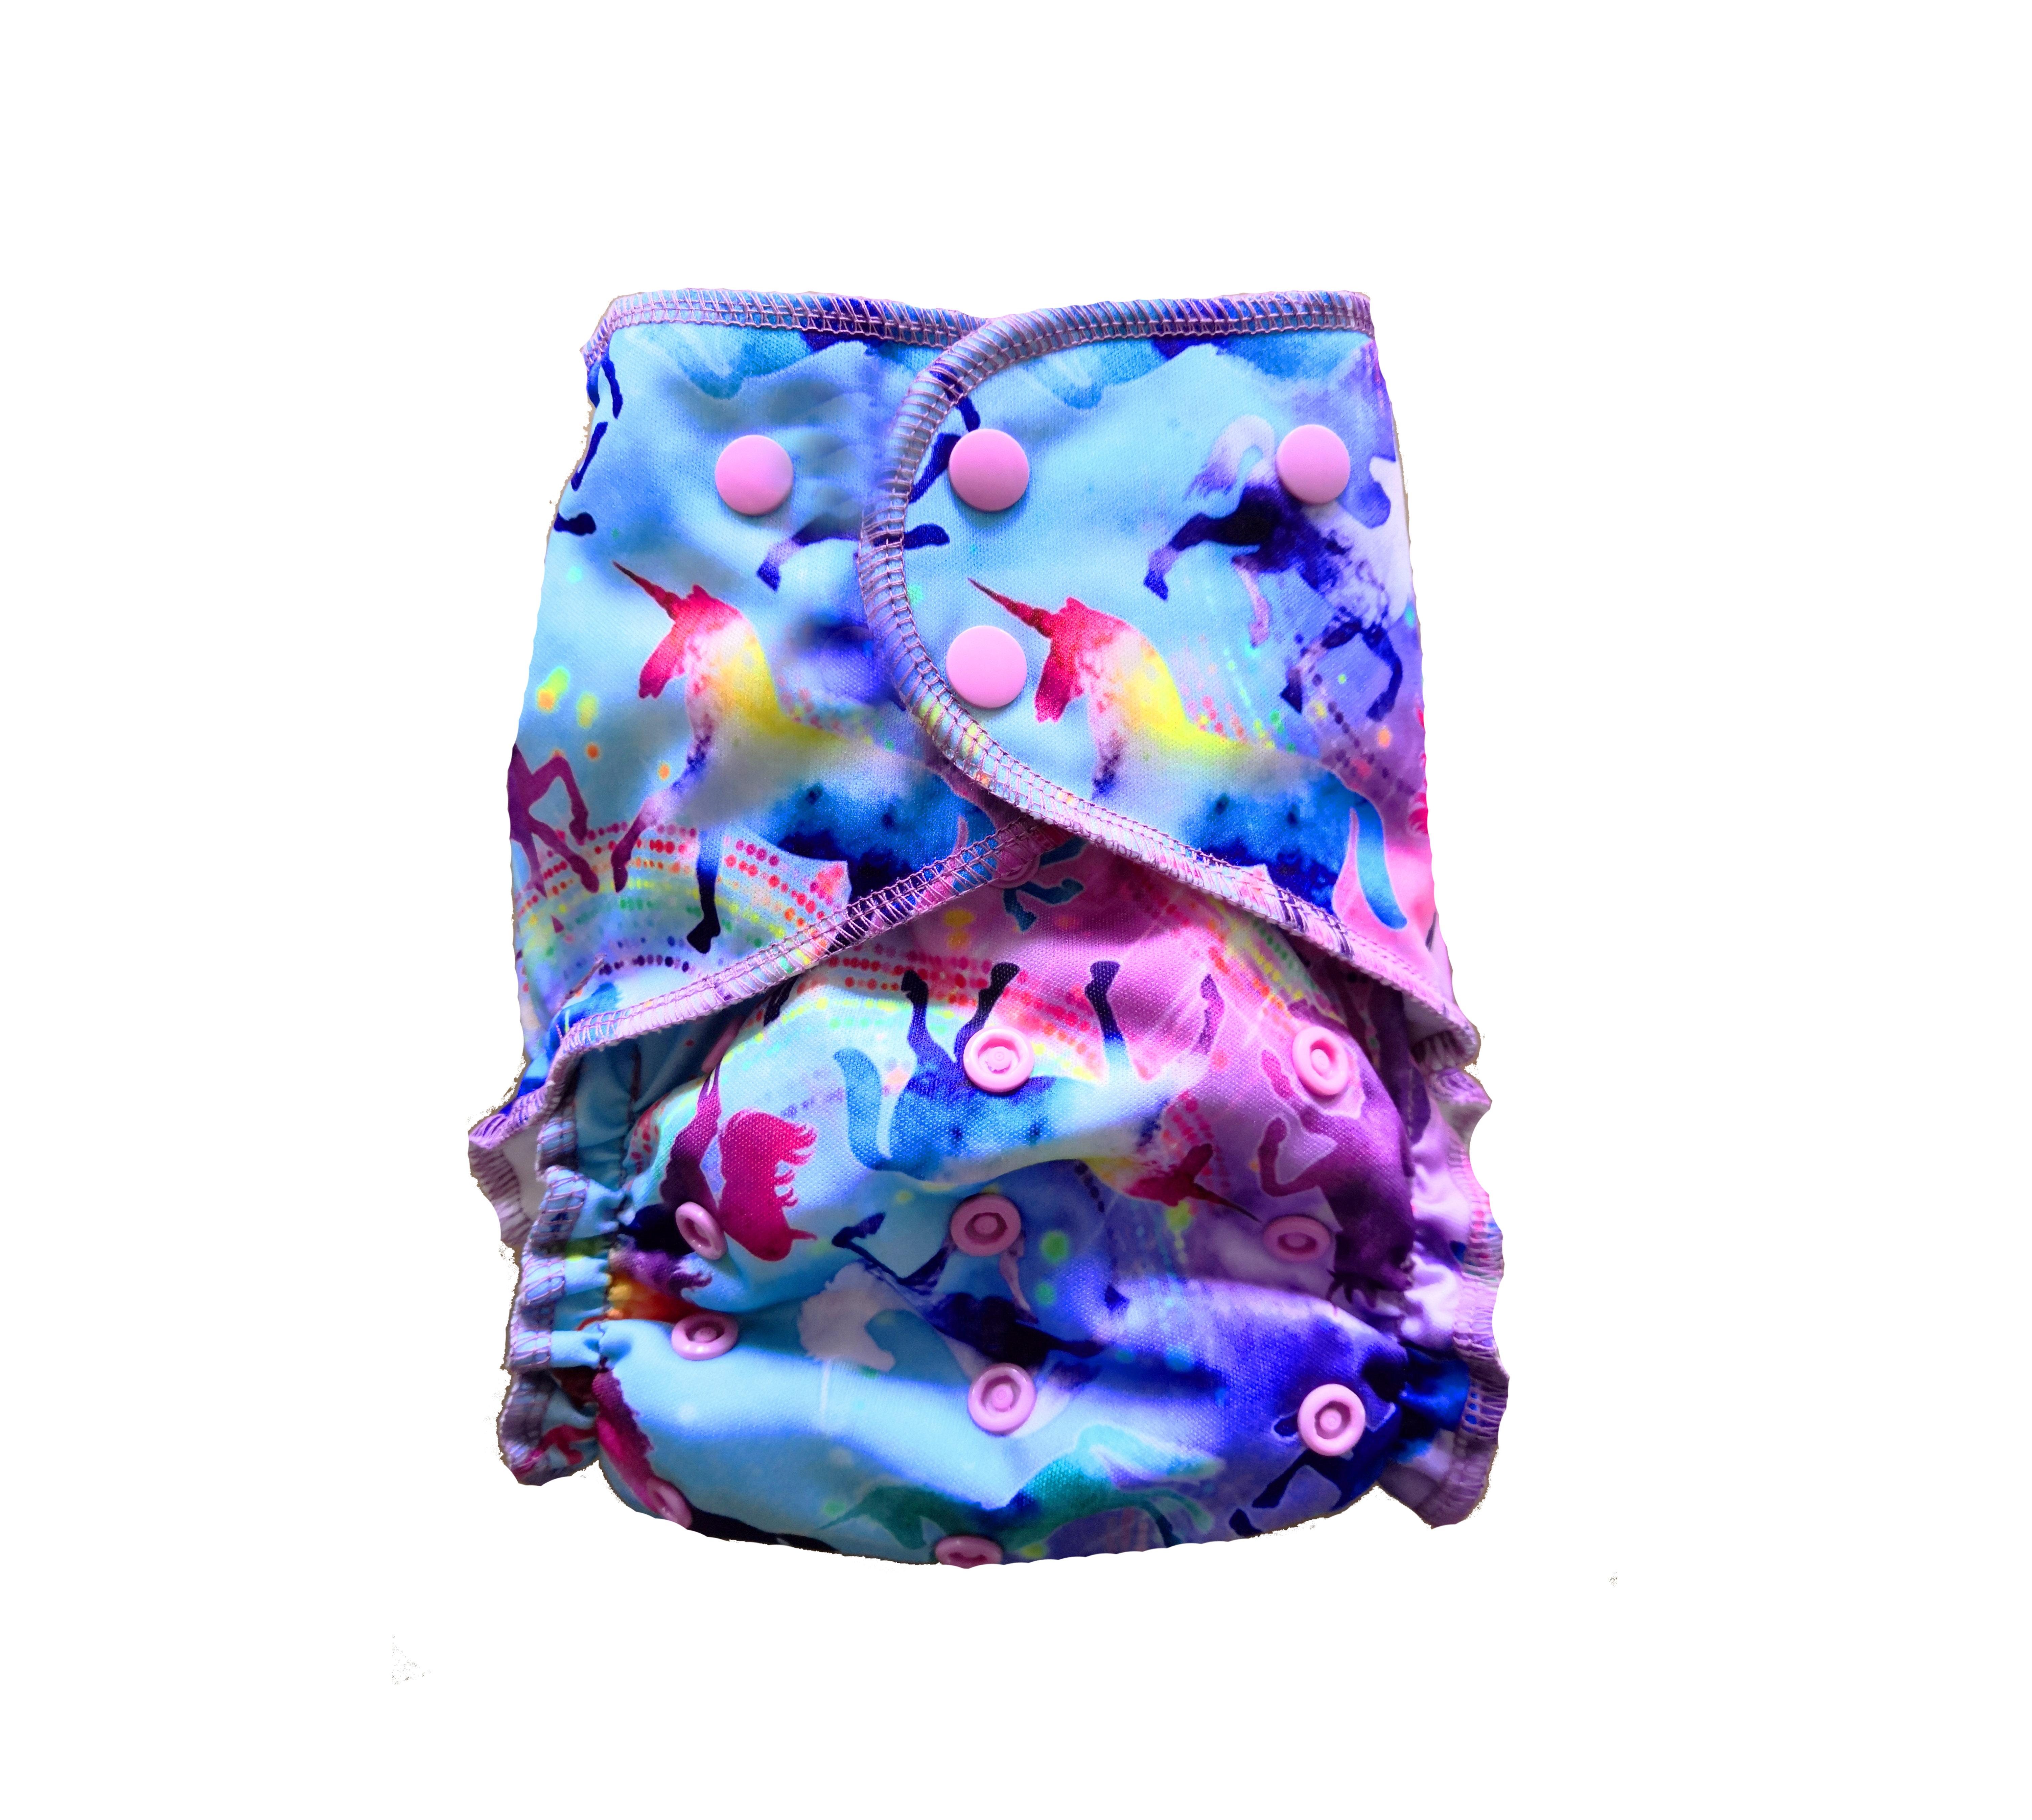 Easy Pocket™ One Size Cloth Diaper - Celeste 00470